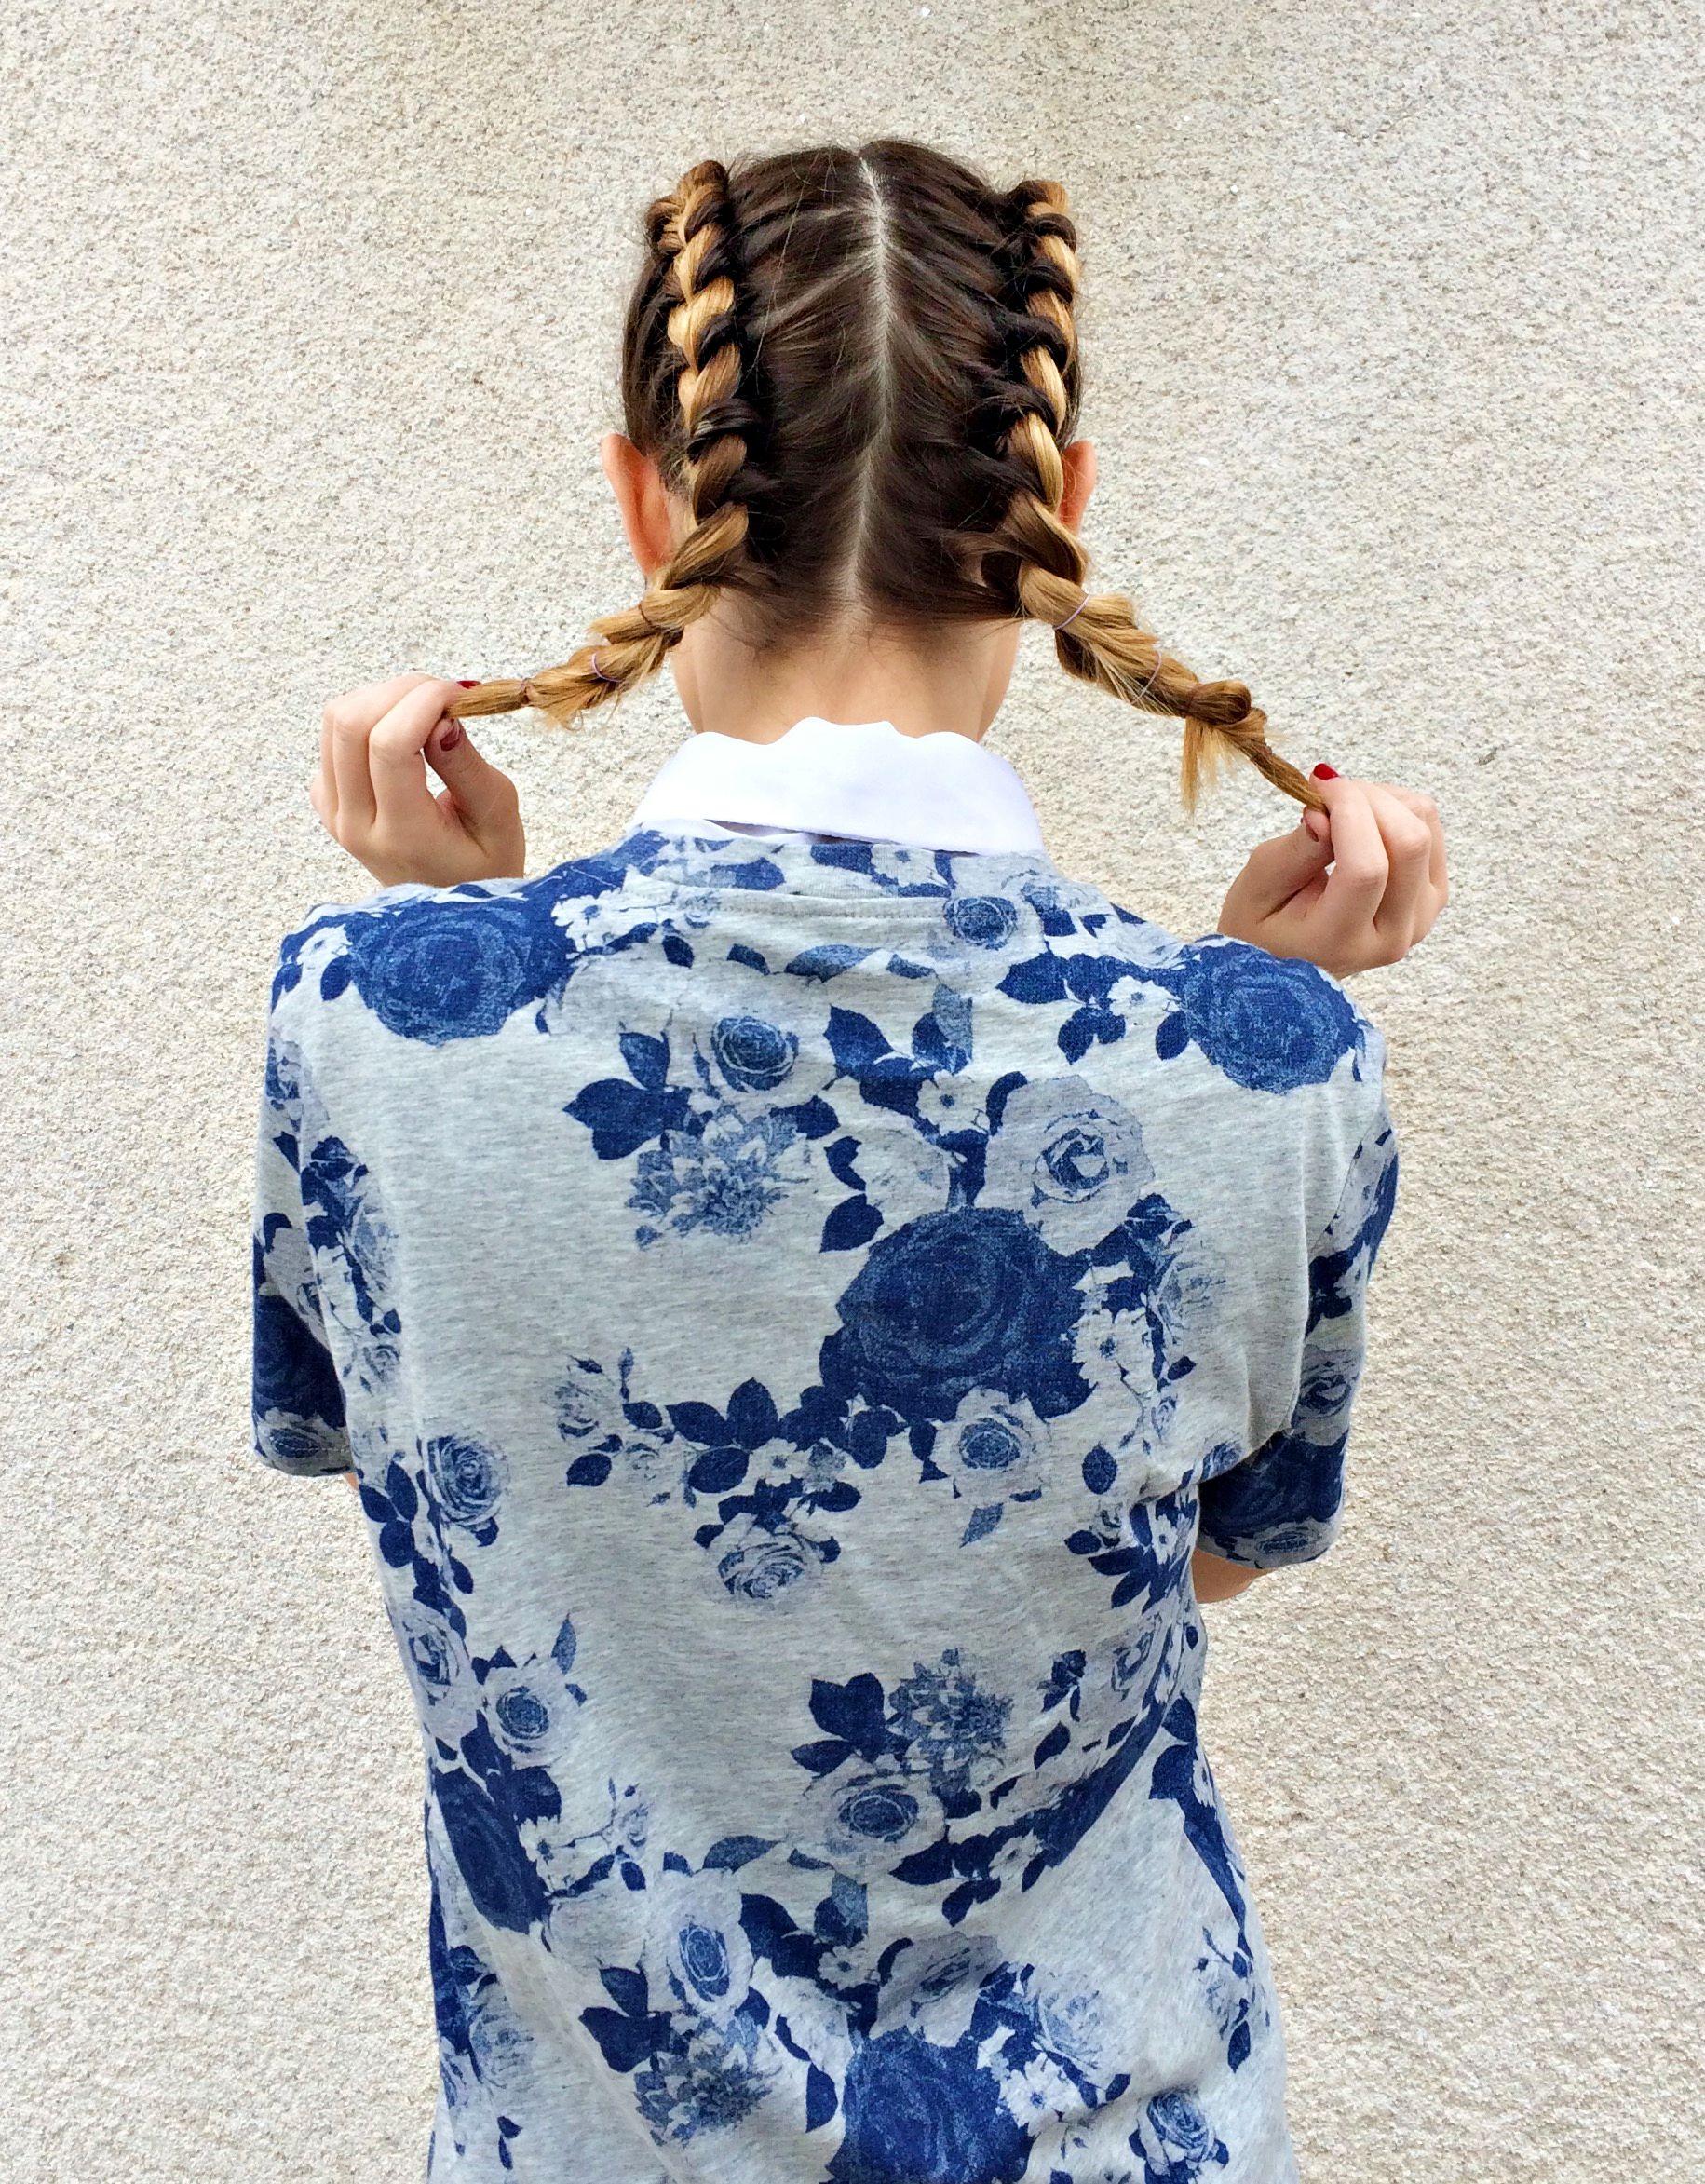 Editors Pick: Svi nose dutch braids